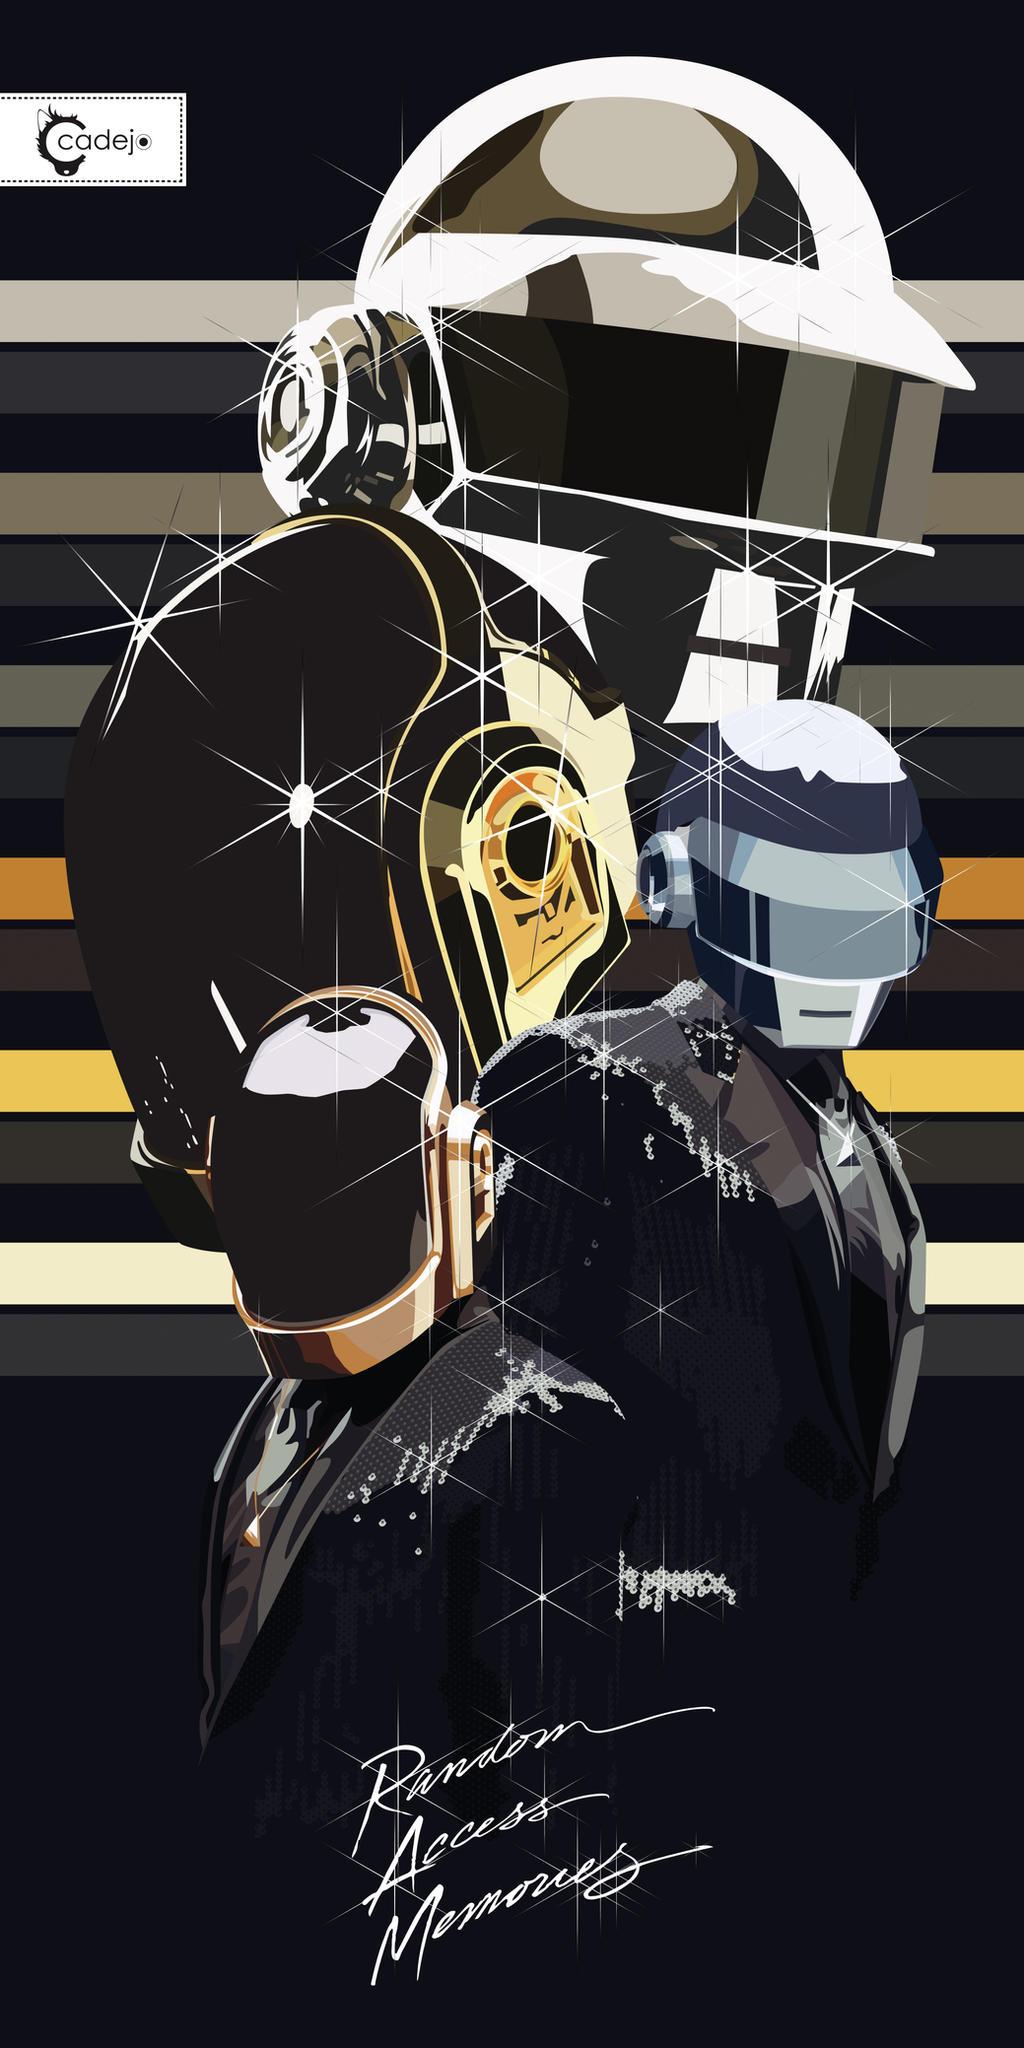 Daft Punk RAM by elcadejoblanco on DeviantArt